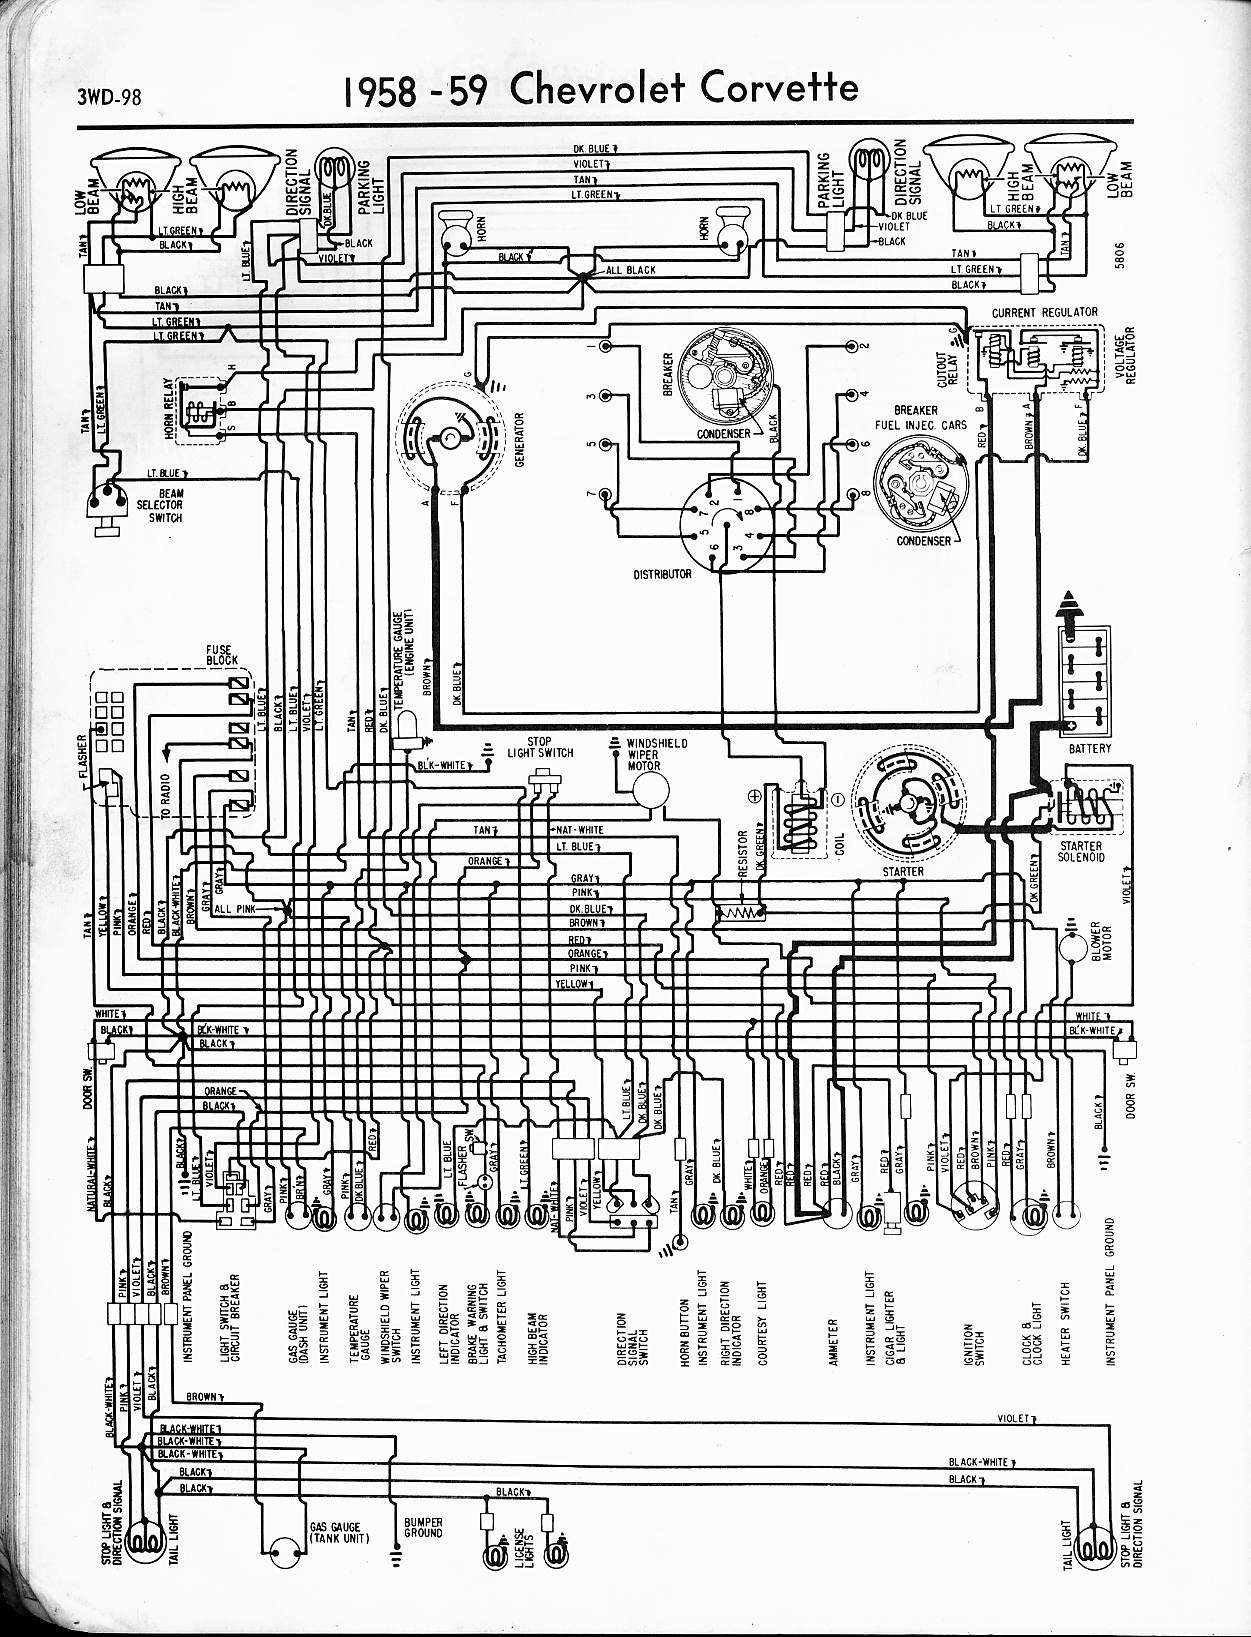 Strange 1958 Chevrolet Steering Column Wiring Wiring Diagram Wiring Cloud Xortanetembamohammedshrineorg